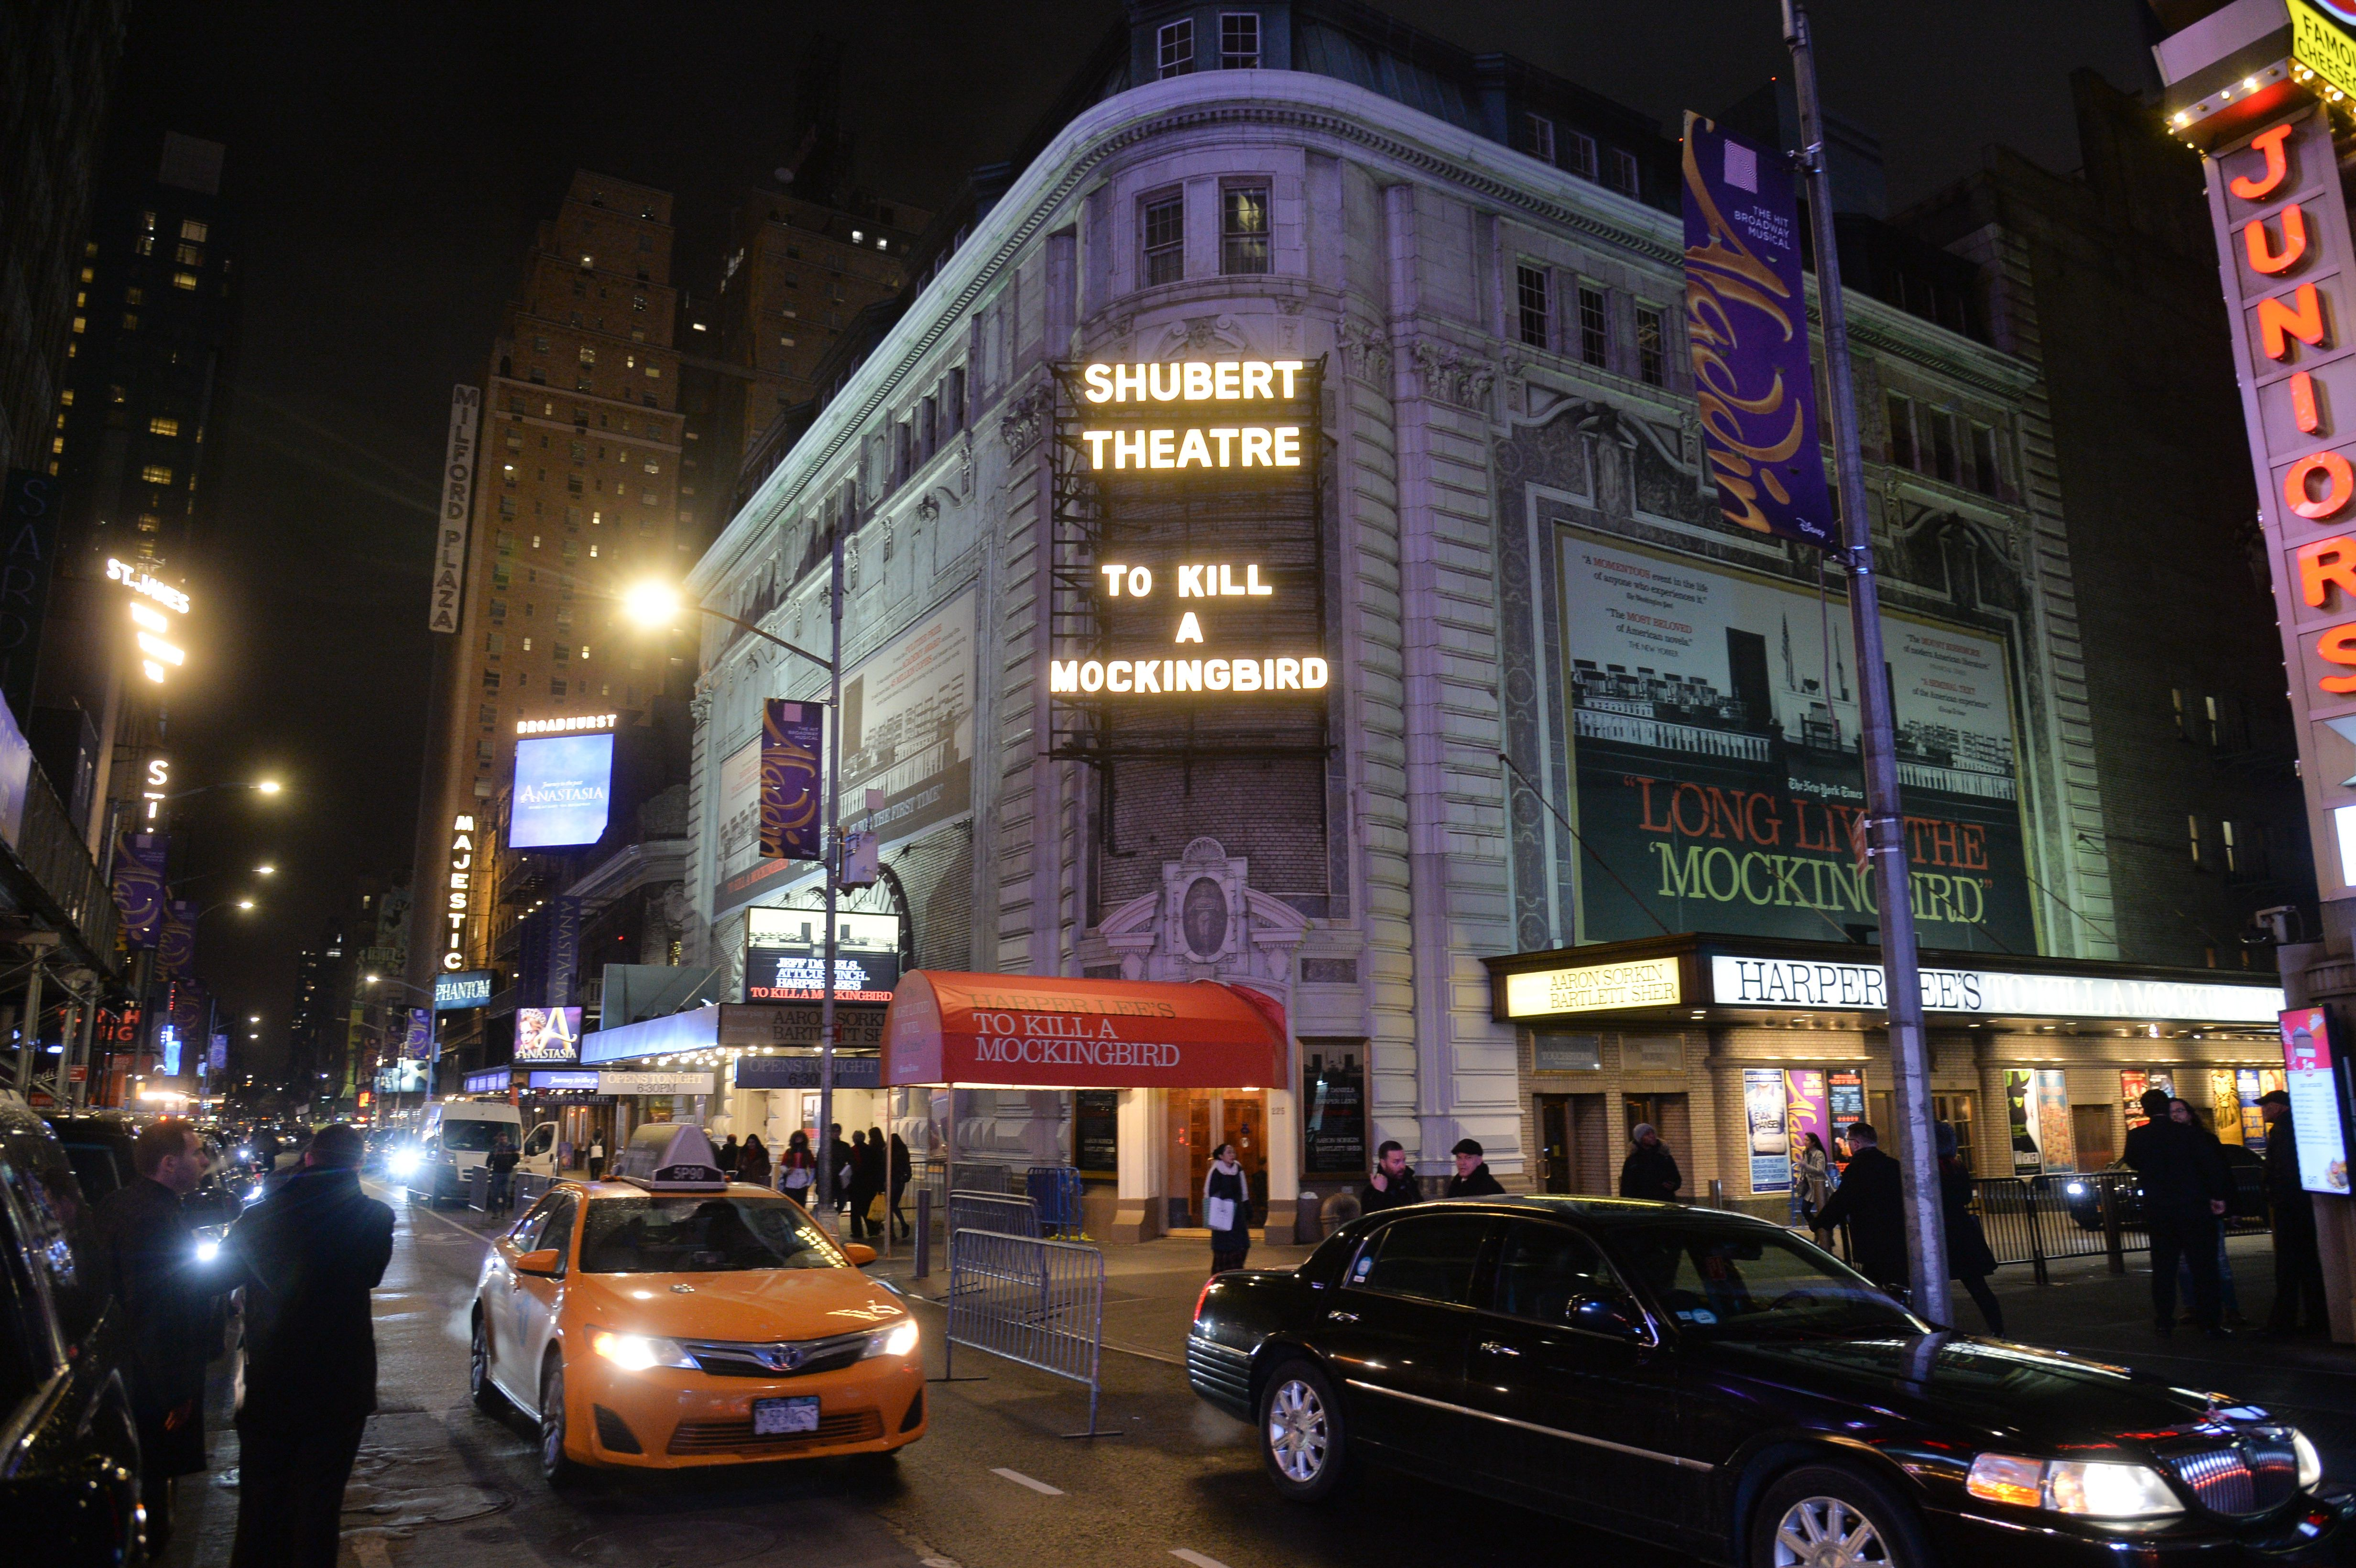 Atmosphere'To Kill a Mockingbird' Broadway play opening night, Arrivals, New York, USA - 13 Dec 2018